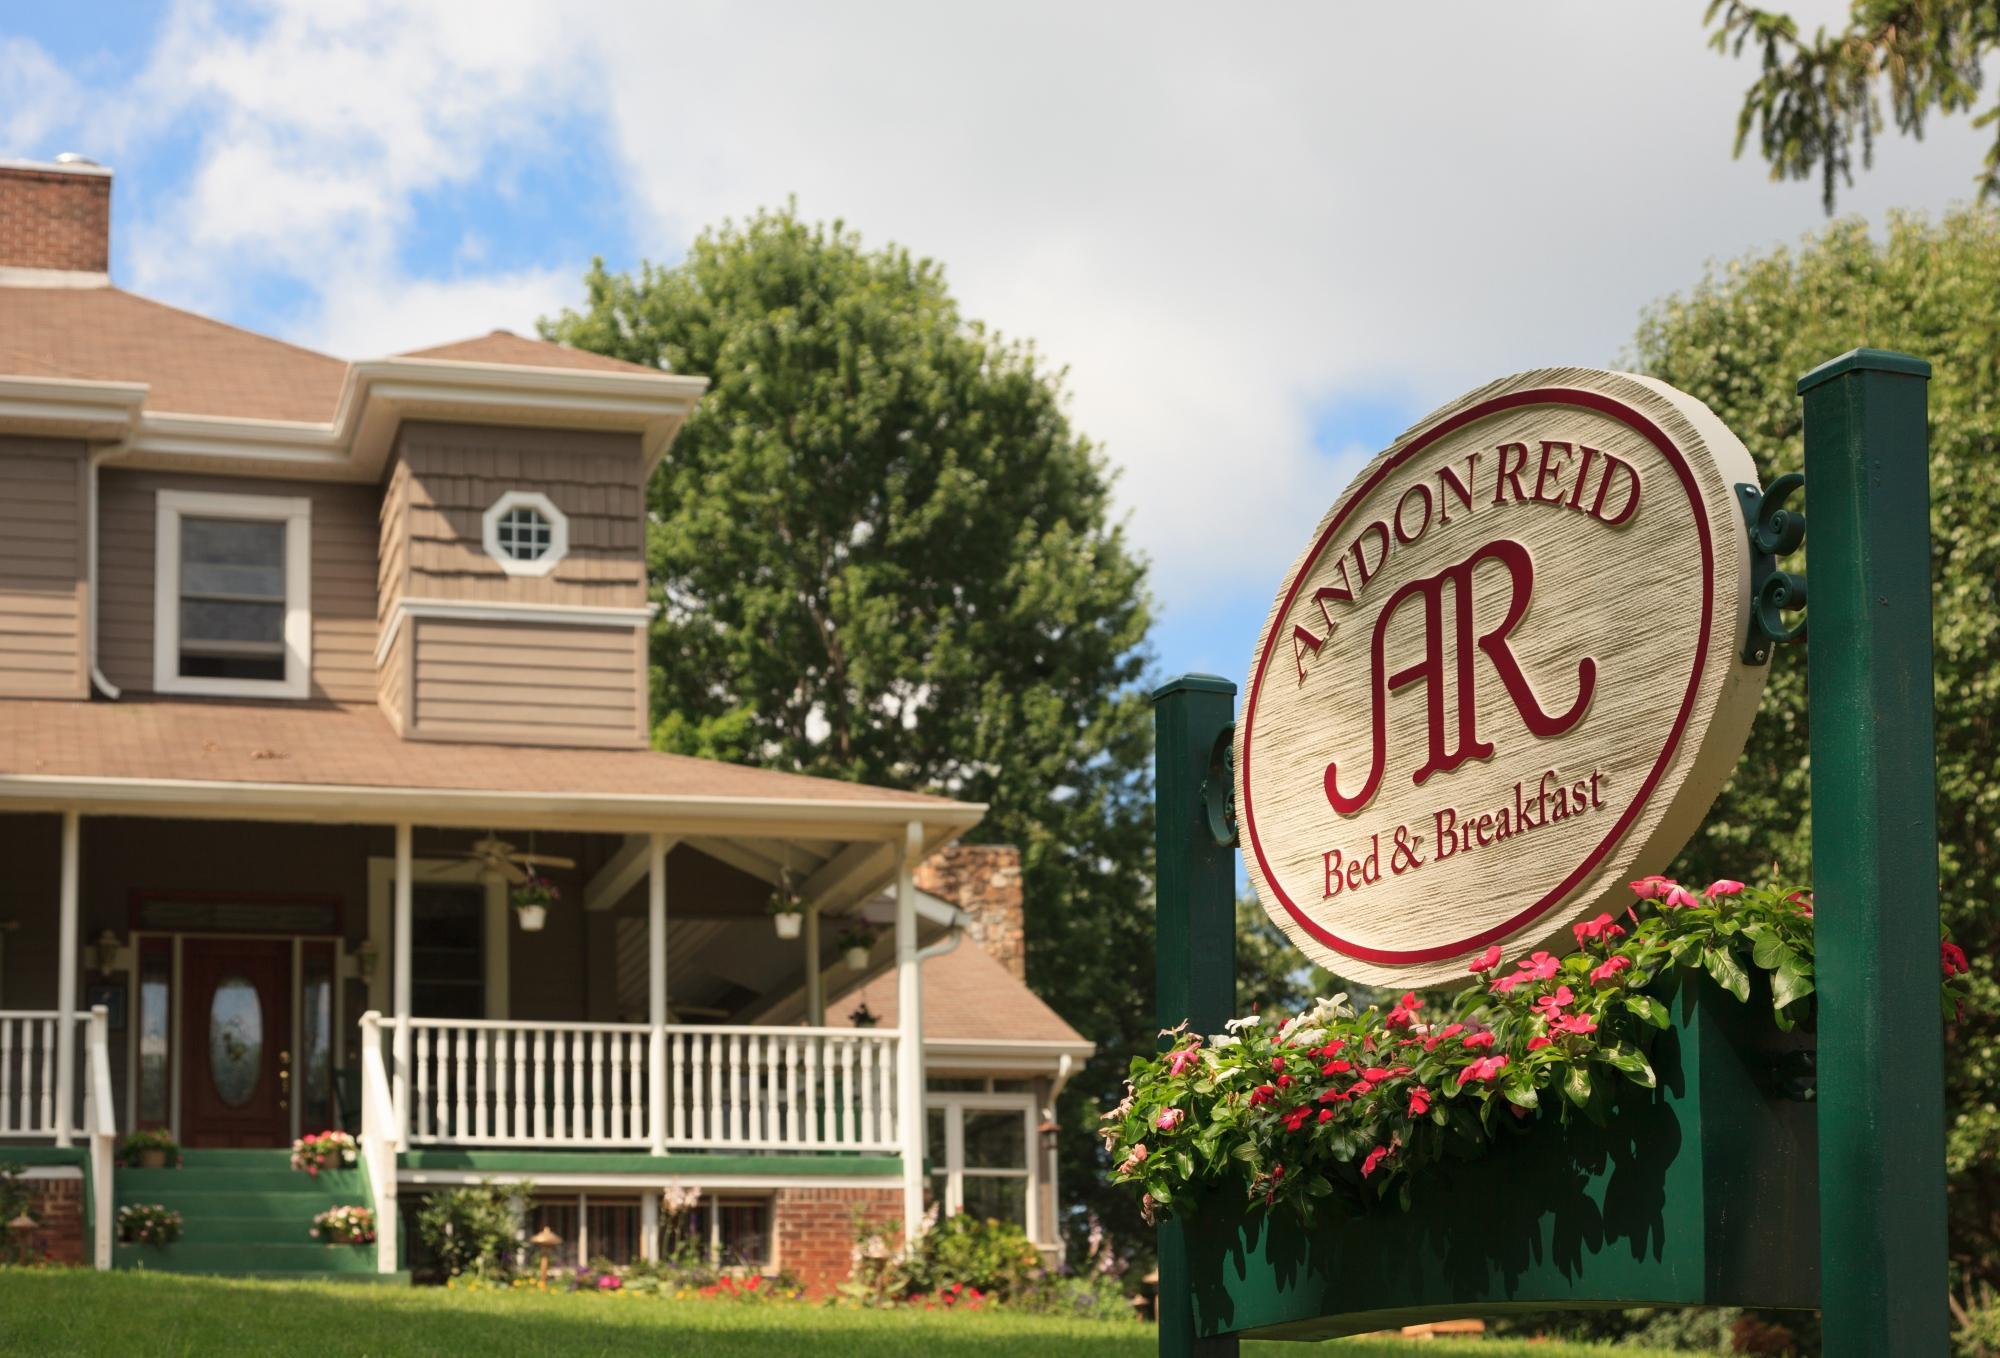 Andon-Reid Inn Bed and Breakfast